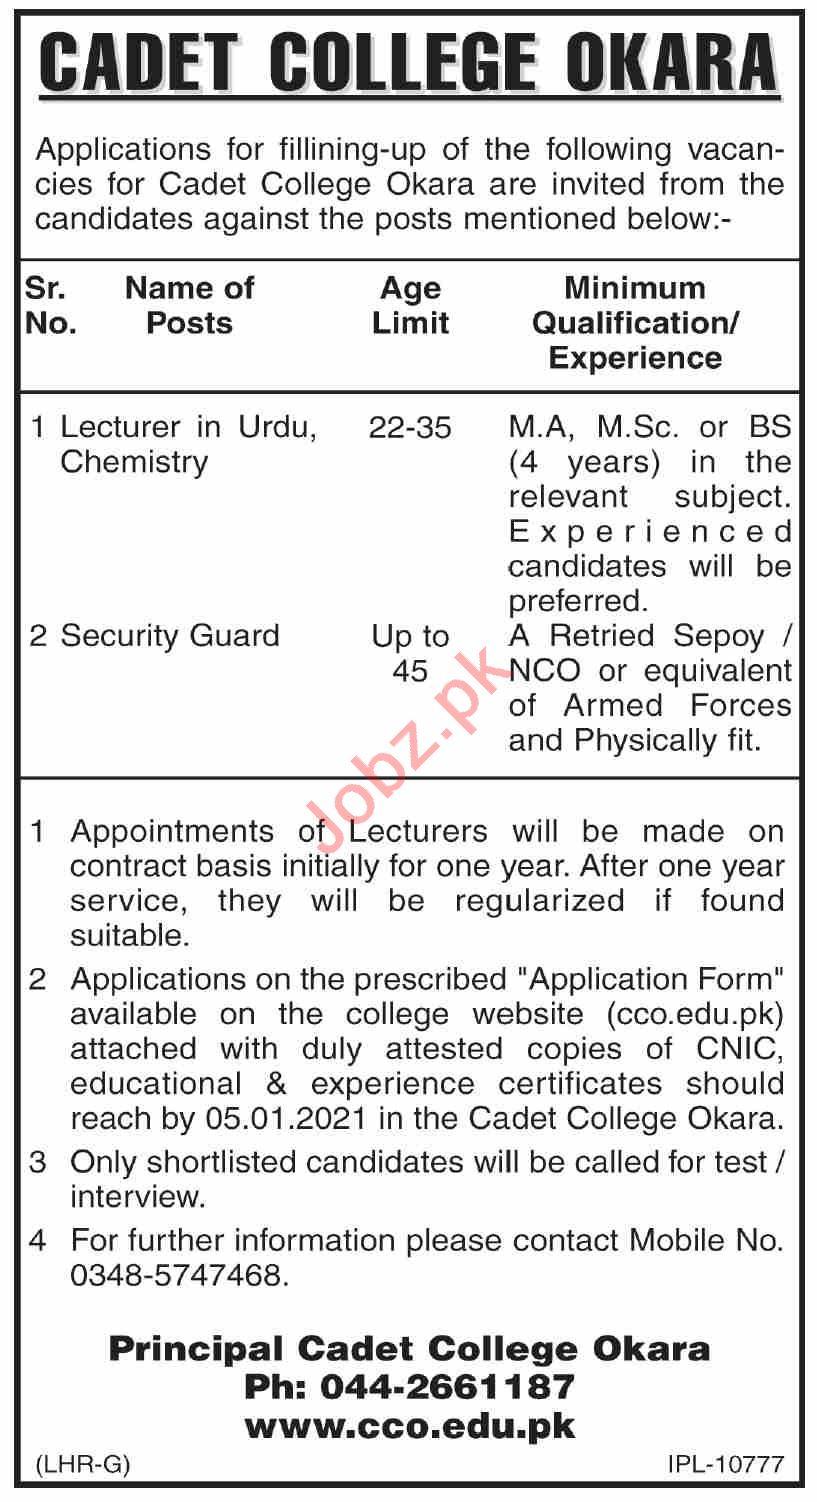 Cadet College Okara Jobs 2021 for Lecturer & Security Guard